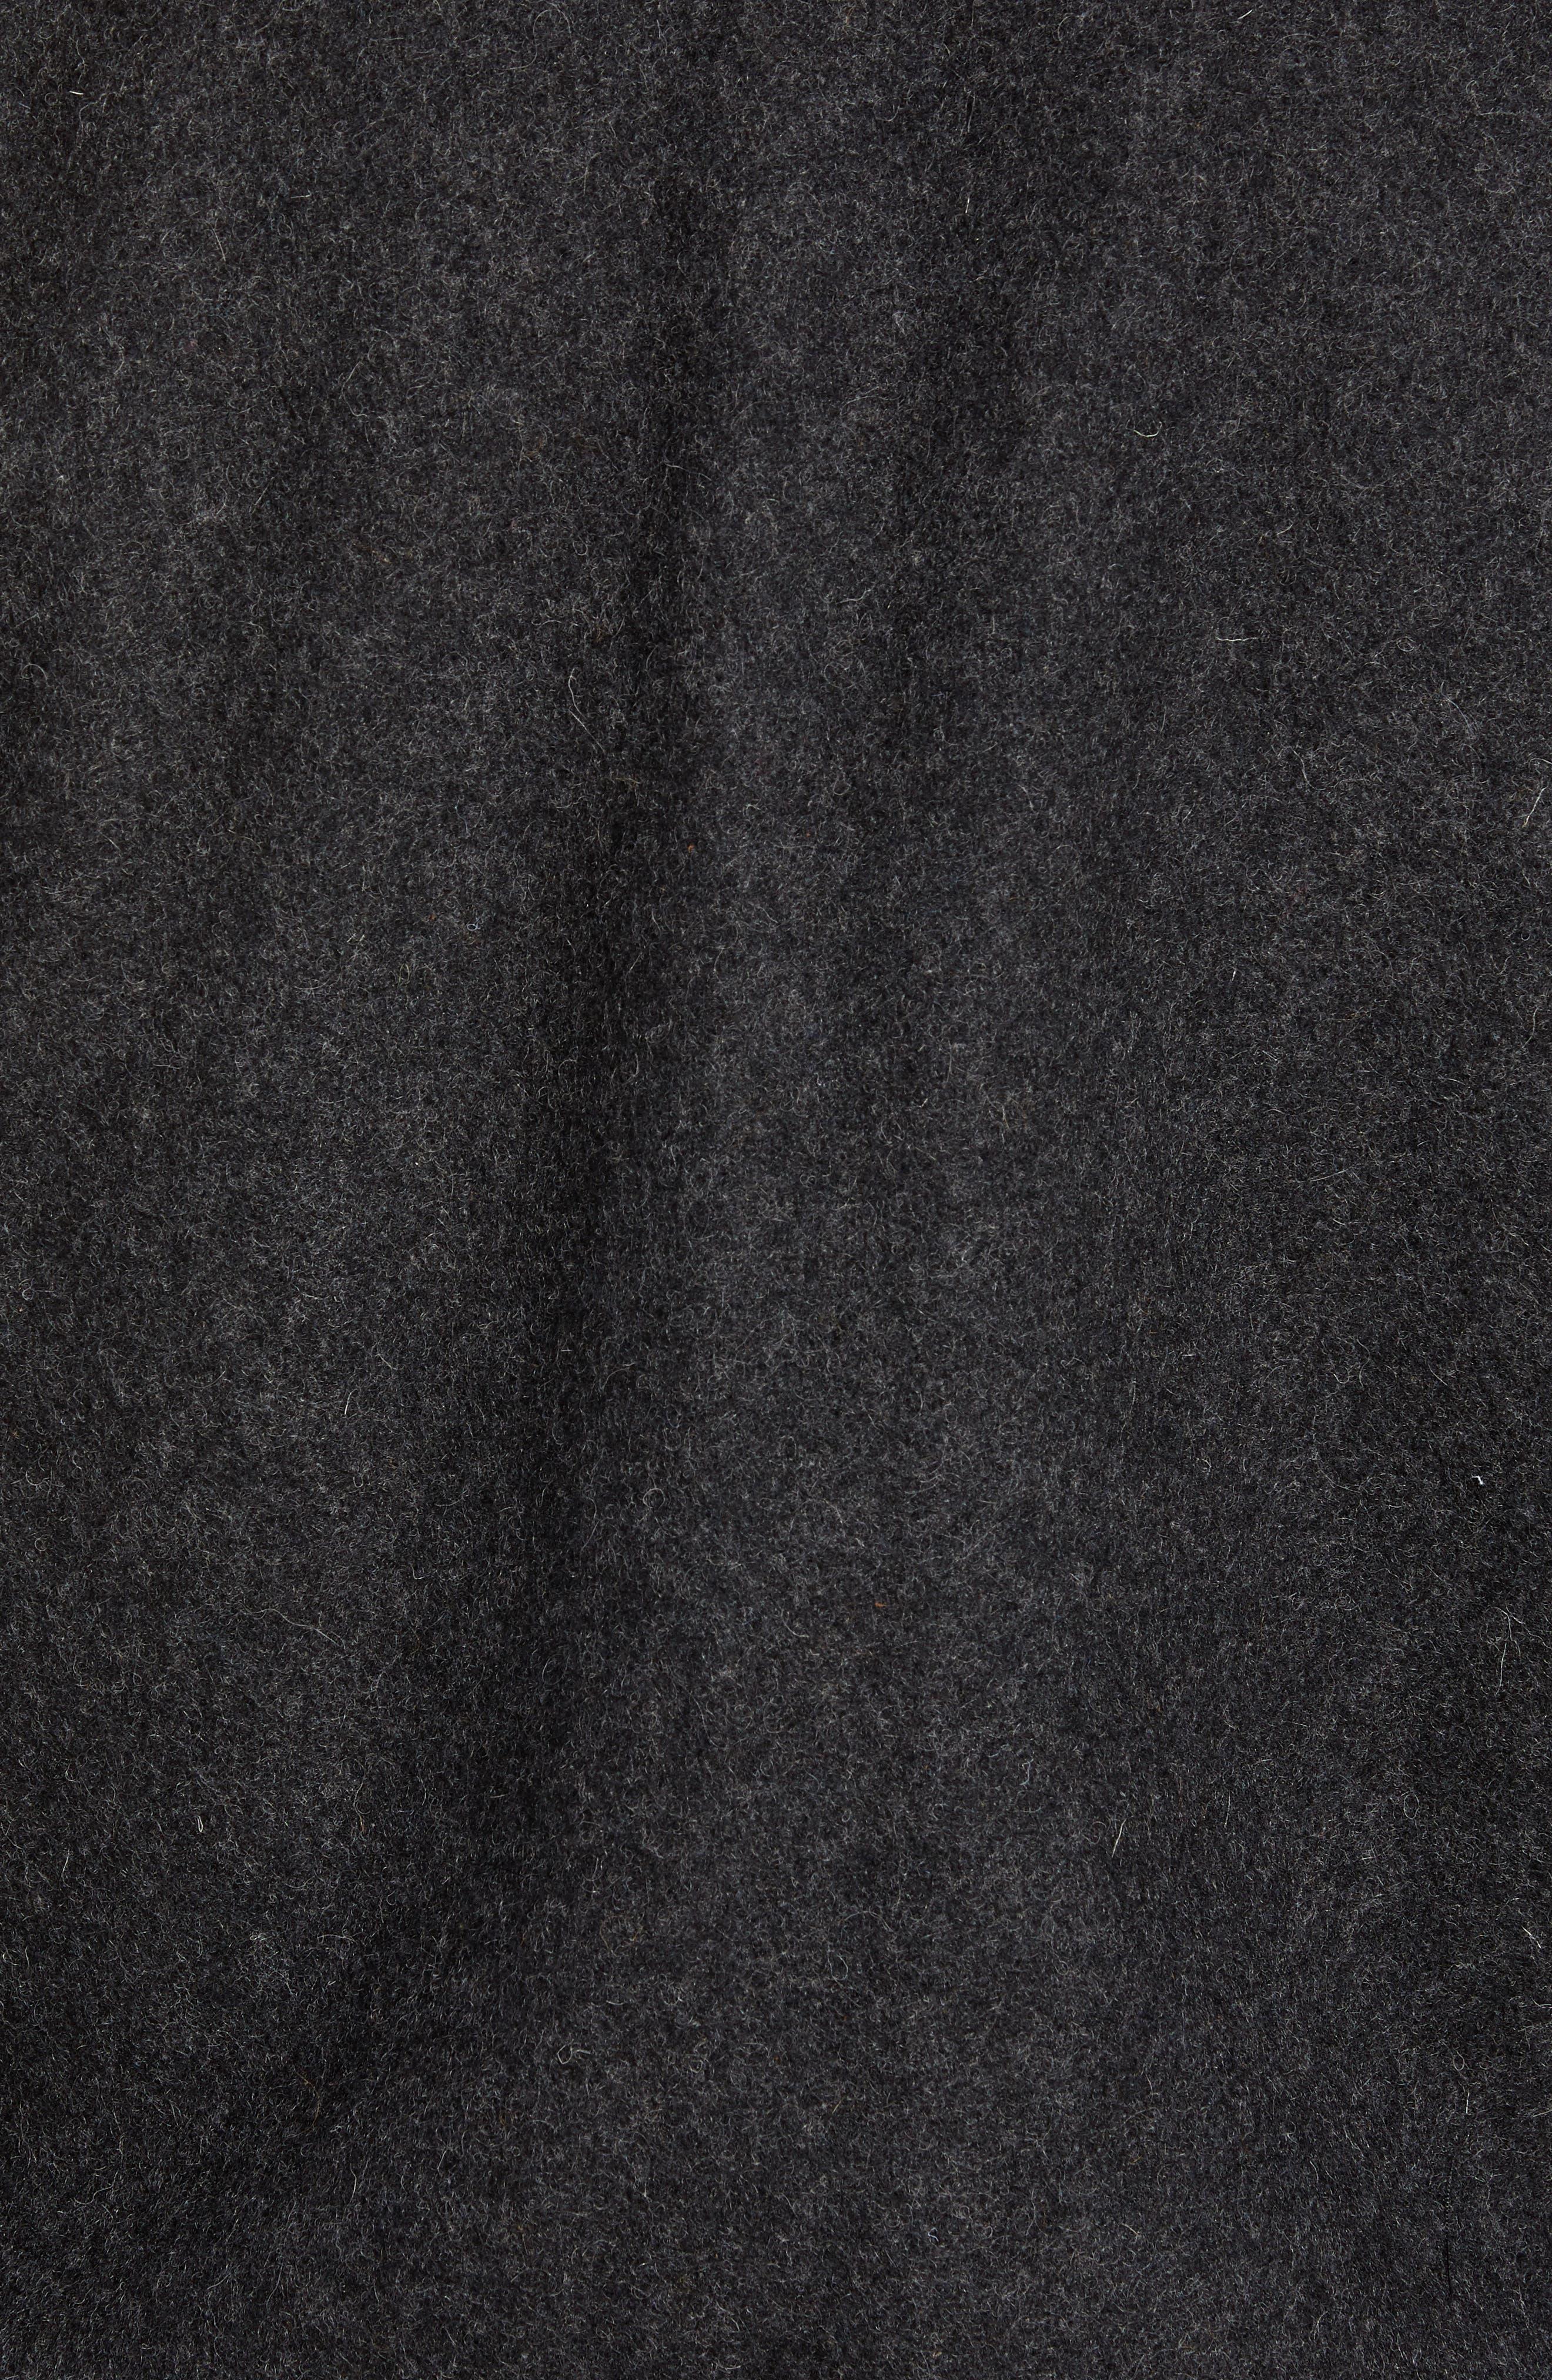 Mixed Media B-15 Flight Jacket with Genuine Shearling Collar,                             Alternate thumbnail 7, color,                             DARK OXFORD